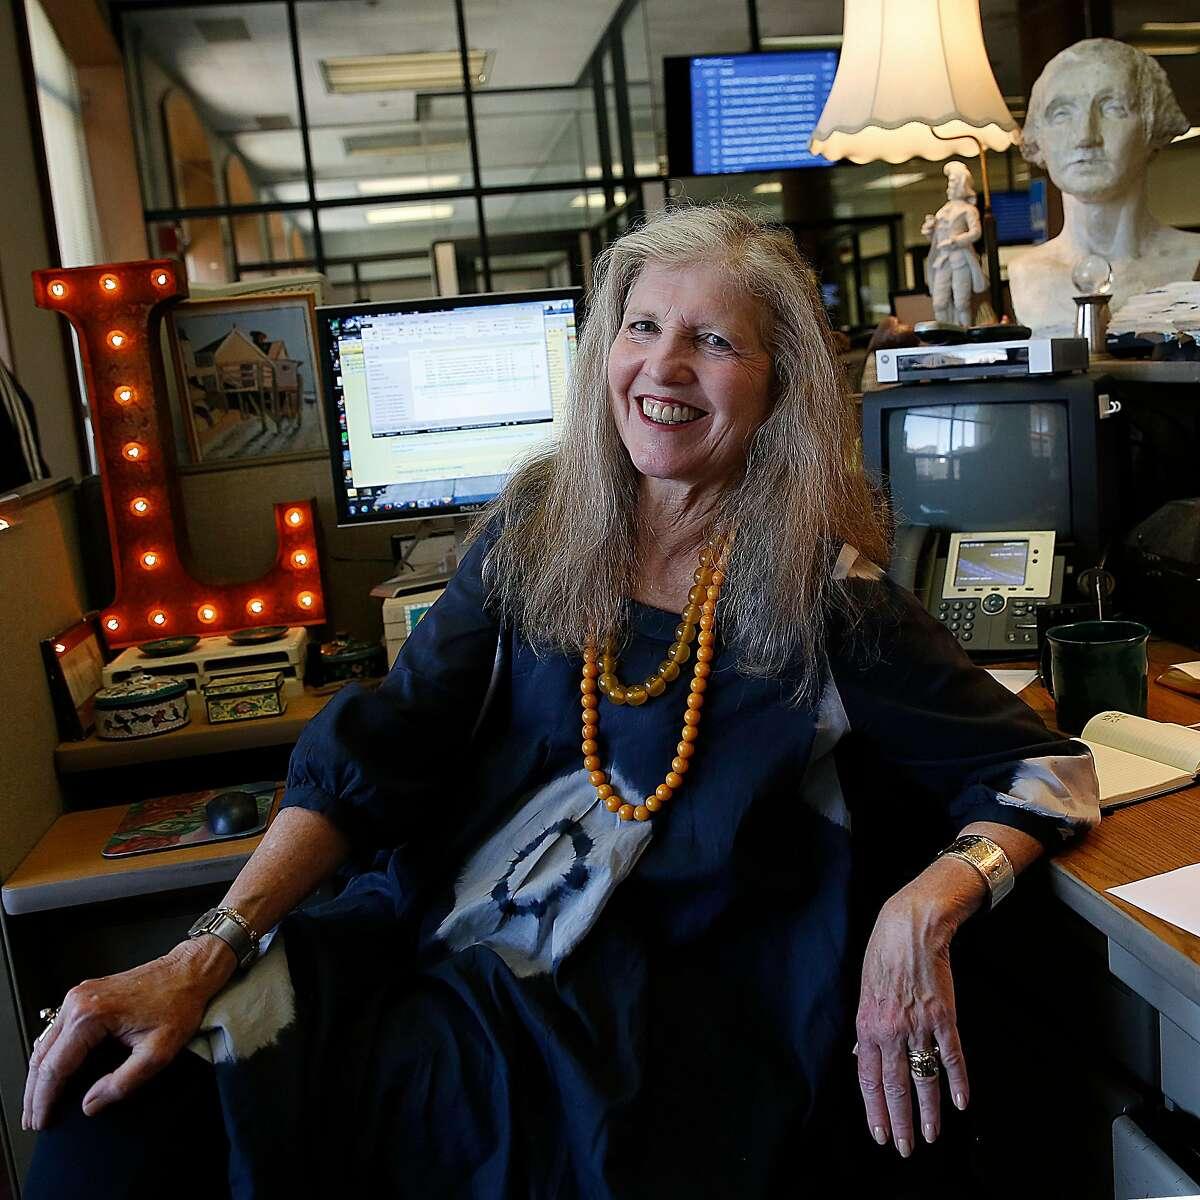 San Francisco Chronicle columnist Leah Garchik at her desk in San Francisco, Calif., on Wednesday, July 15, 2015.